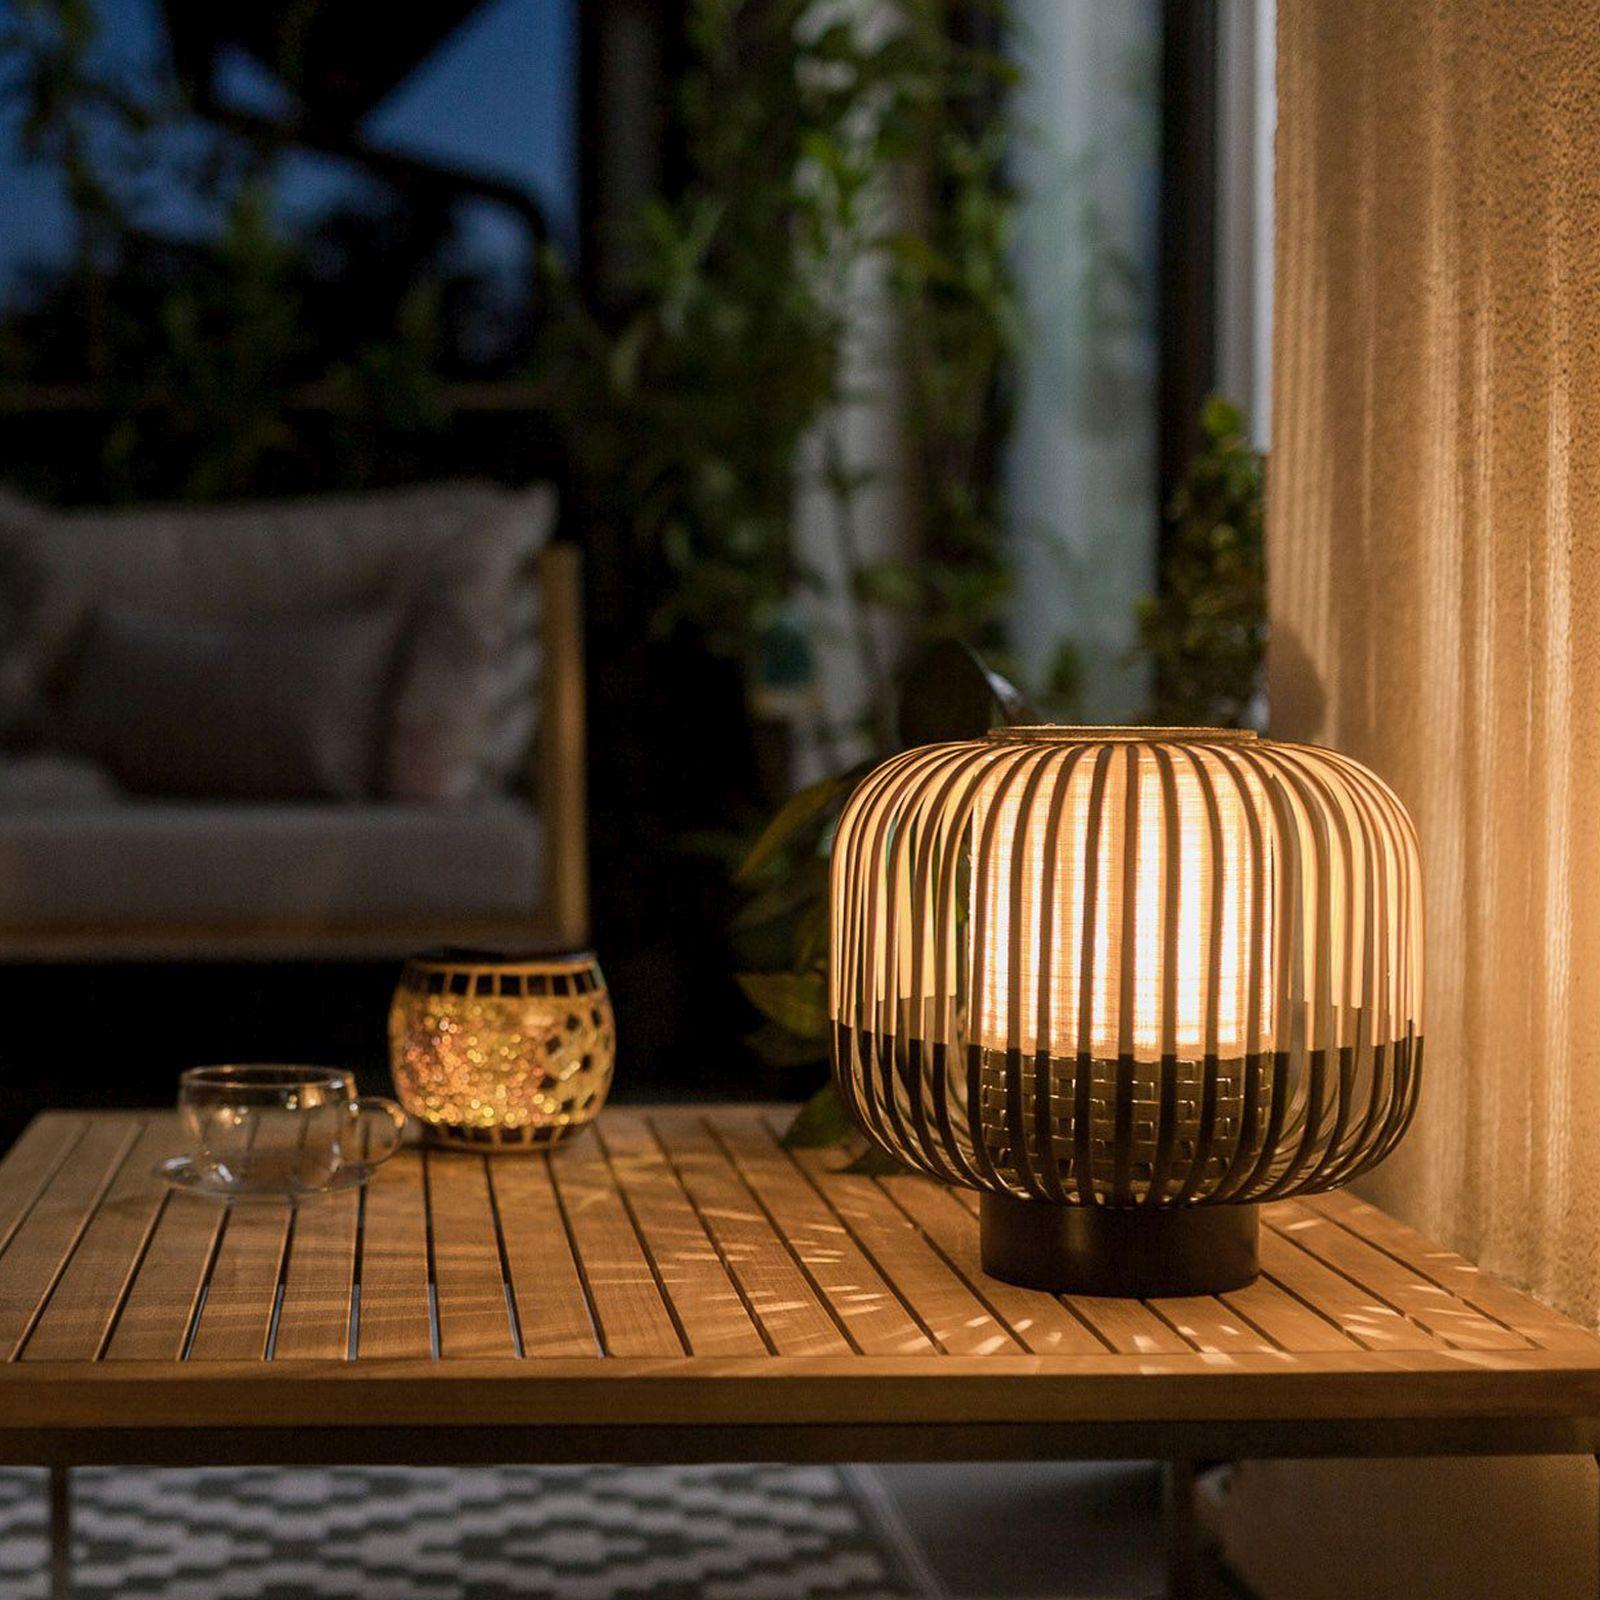 Forestier Bamboo Light S Tischlampe 24 cm schwarz